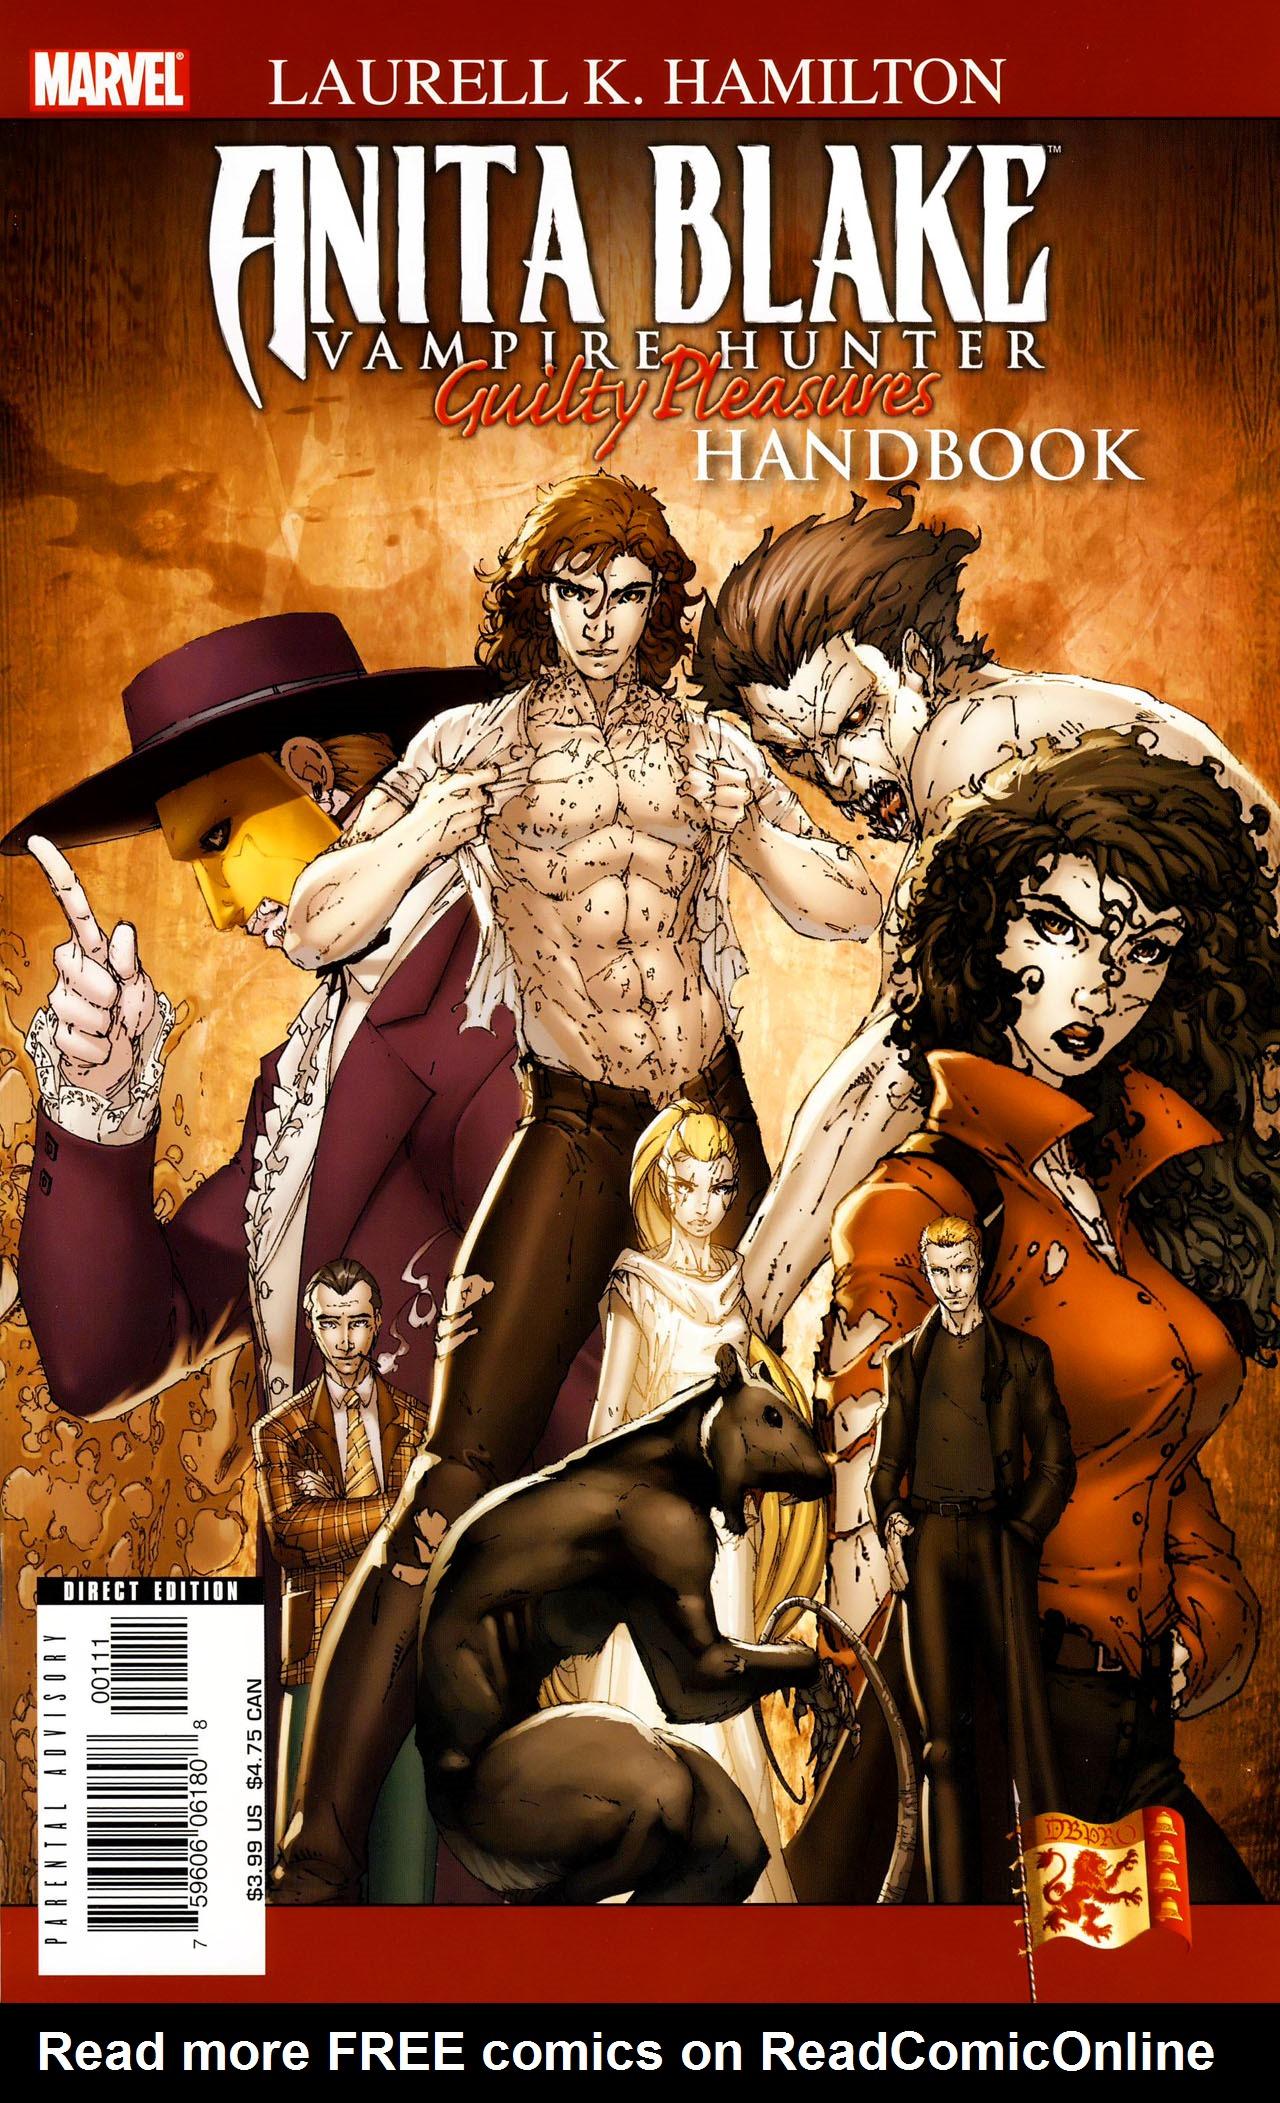 Read online Anita Blake, Vampire Hunter: Guilty Pleasures Handbook comic -  Issue #Anita Blake, Vampire Hunter: Guilty Pleasures Handbook Full - 1